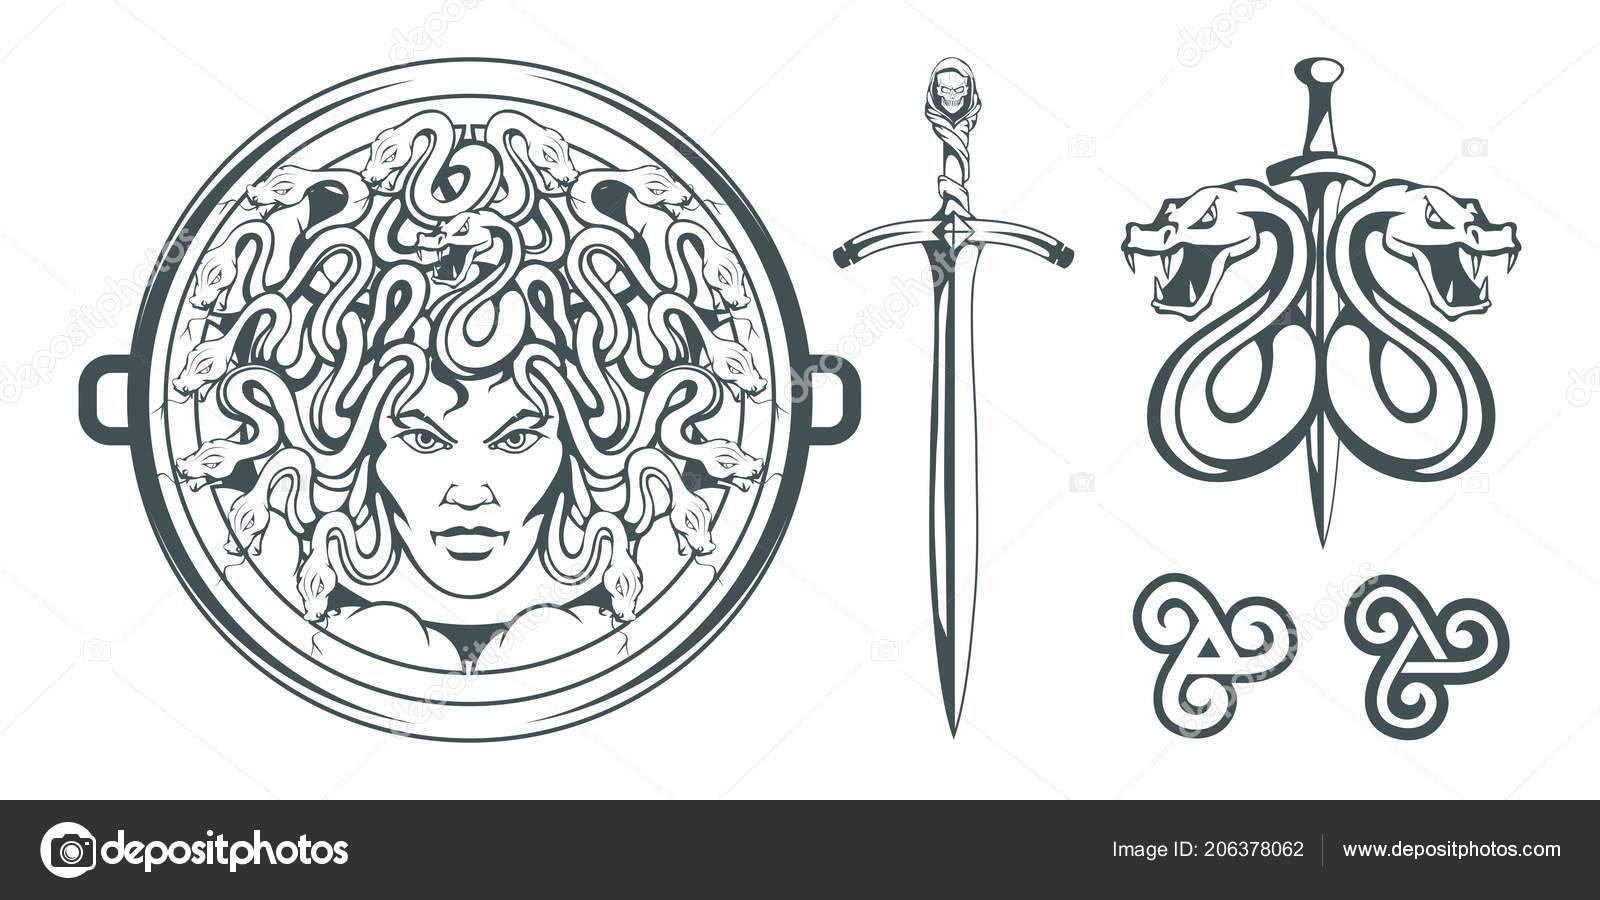 Gorgone Meduse Monstre Avec Visage Feminin Des Serpents Lieu Des